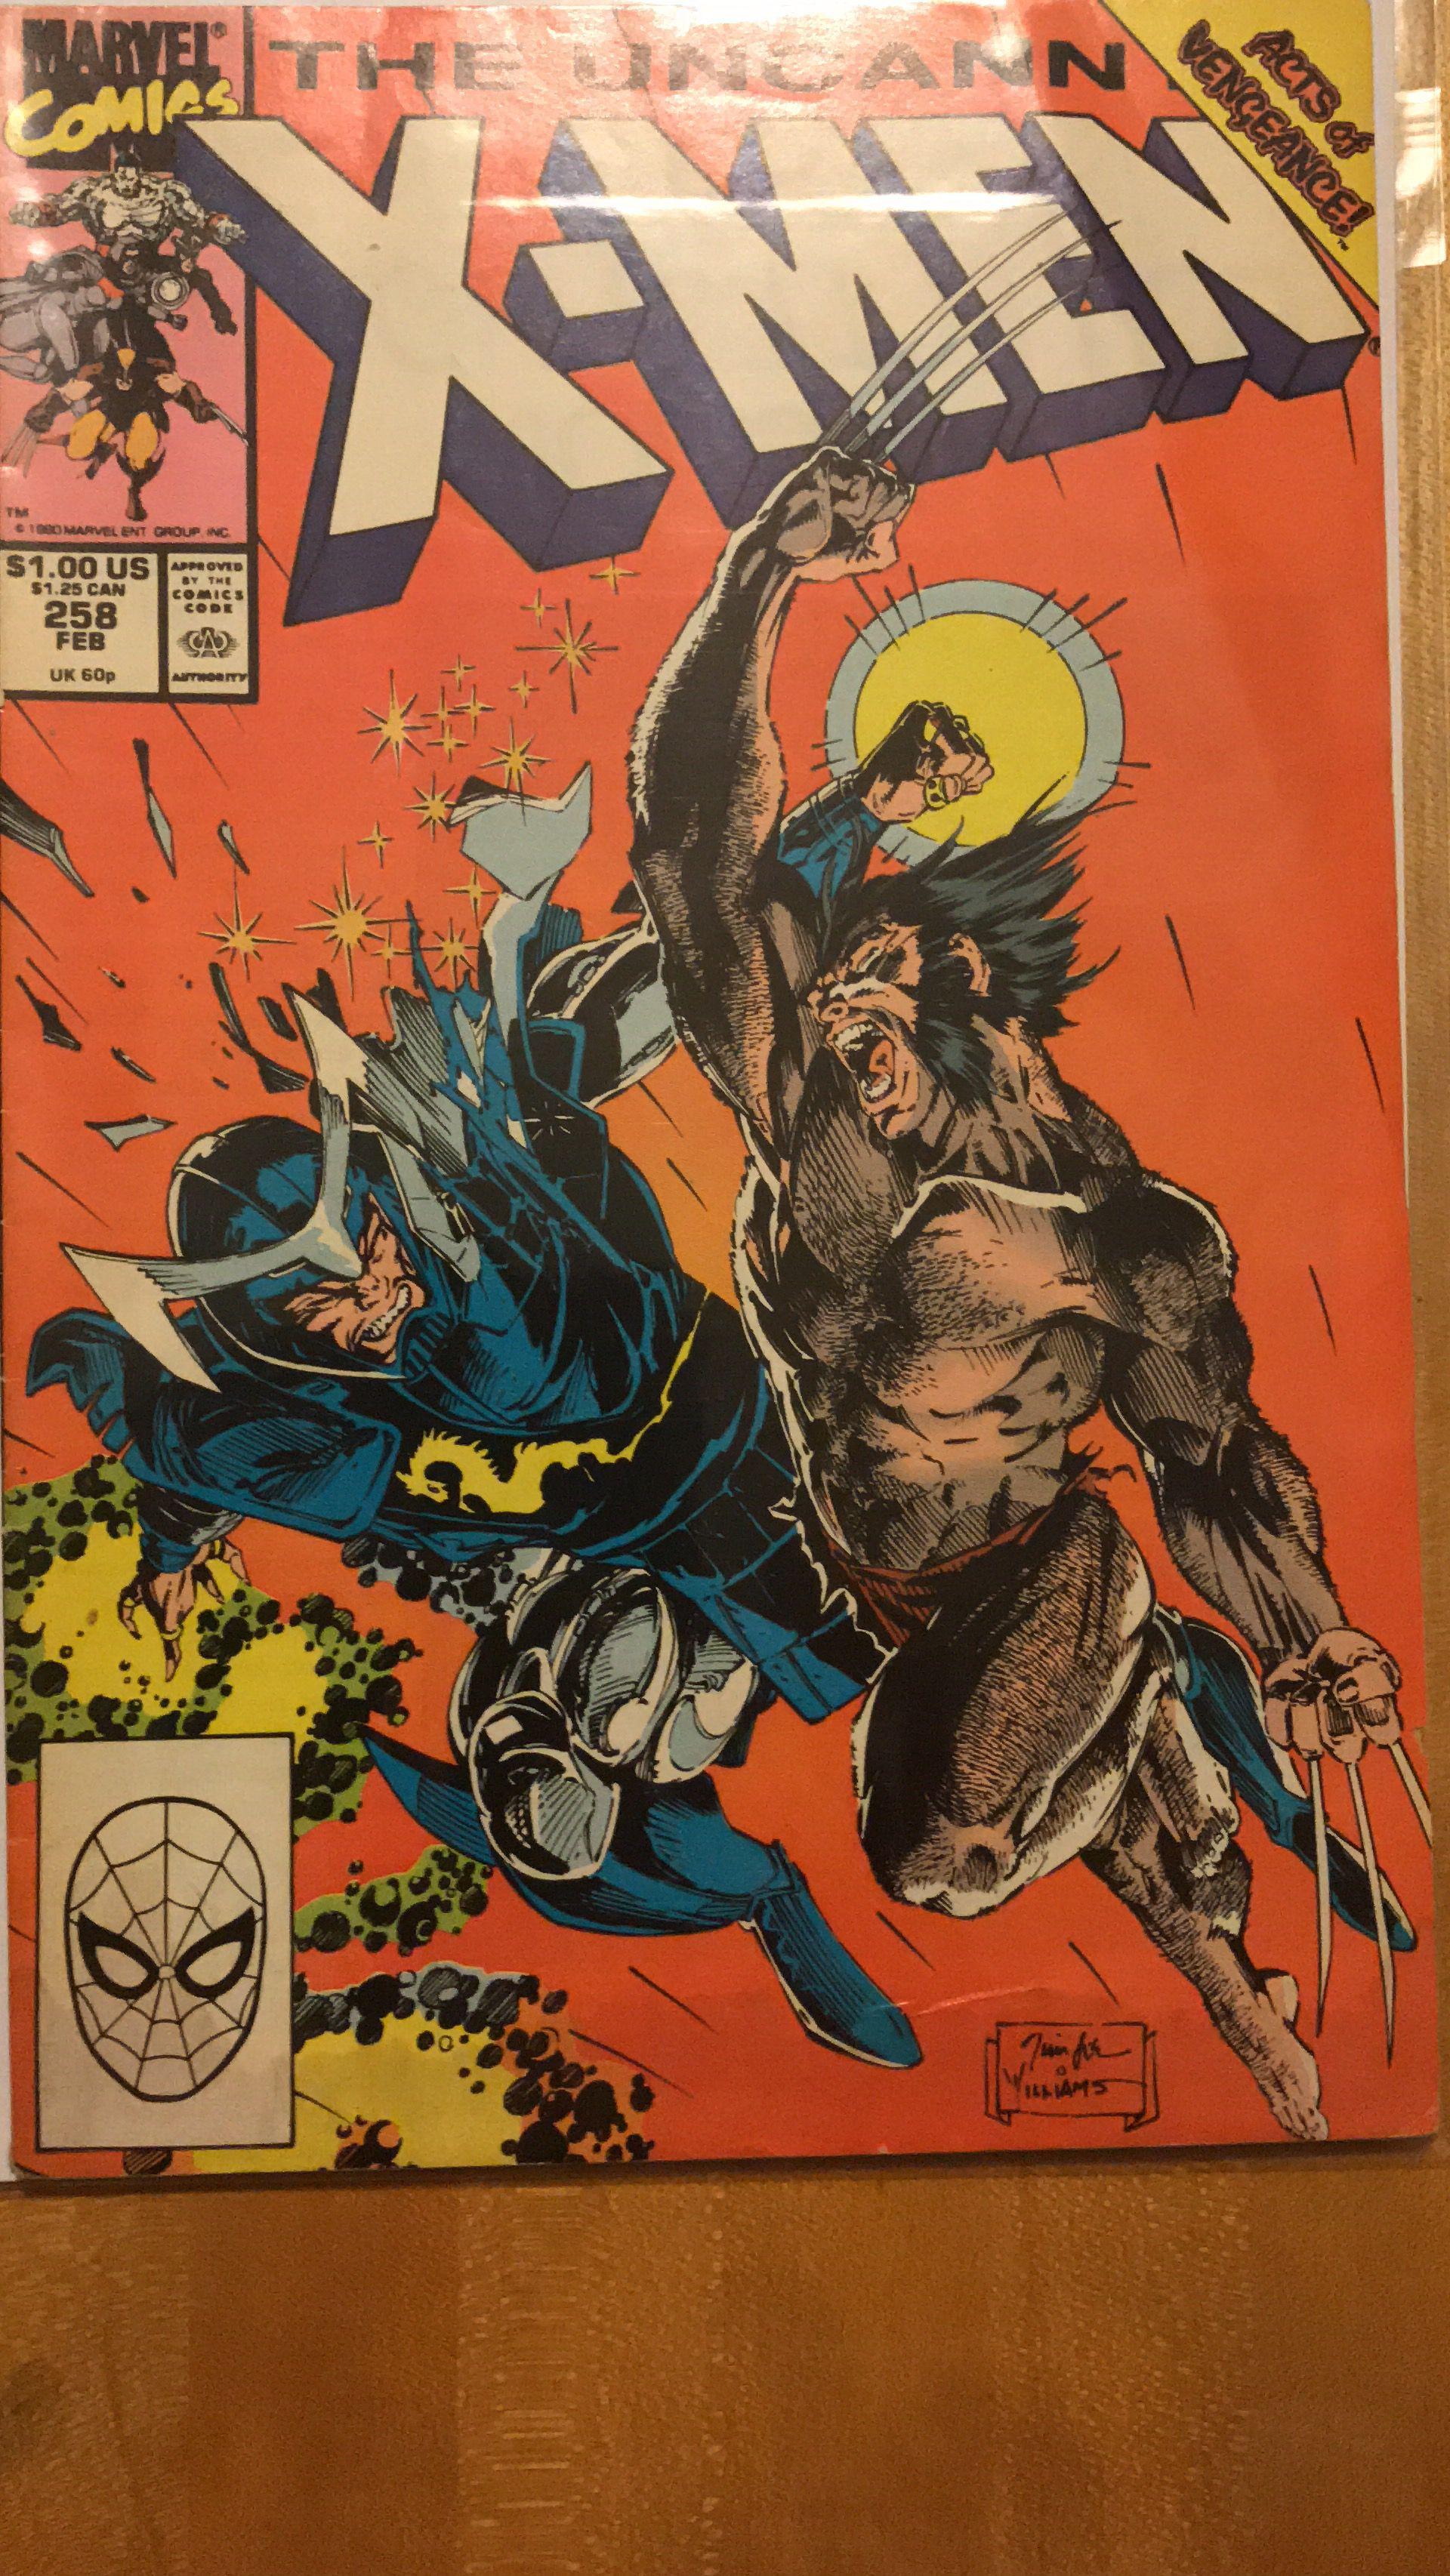 The Uncanny X Men 258 The Uncanny Comic Book Cover Comic Books